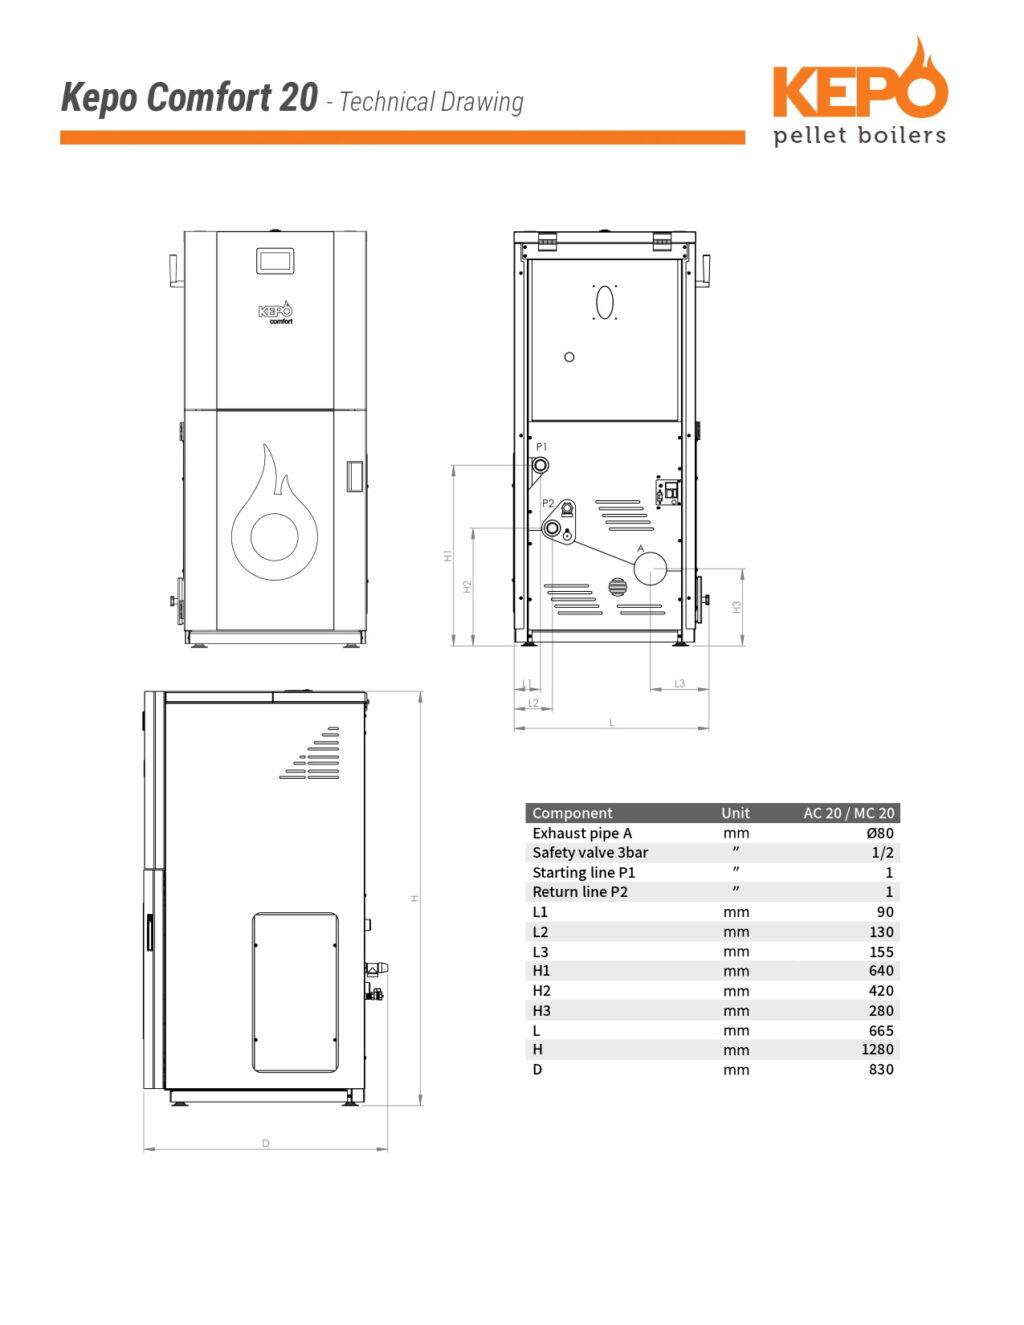 Kepo Comfort20 Techical Drawing